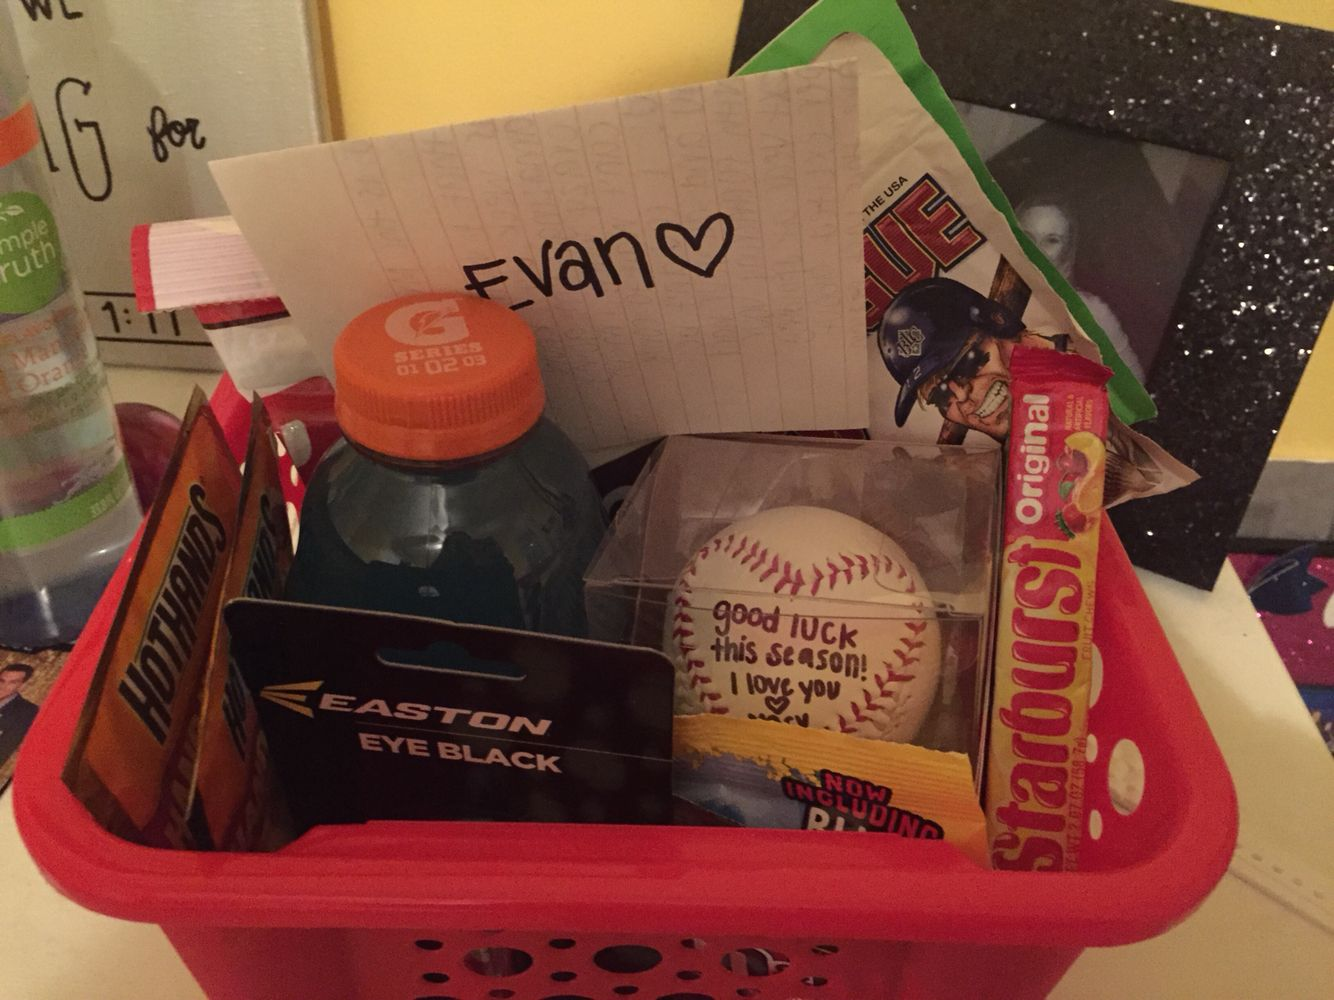 Baseball boyfriend gift basket gift ideas pinterest for What is a good gift for my boyfriend